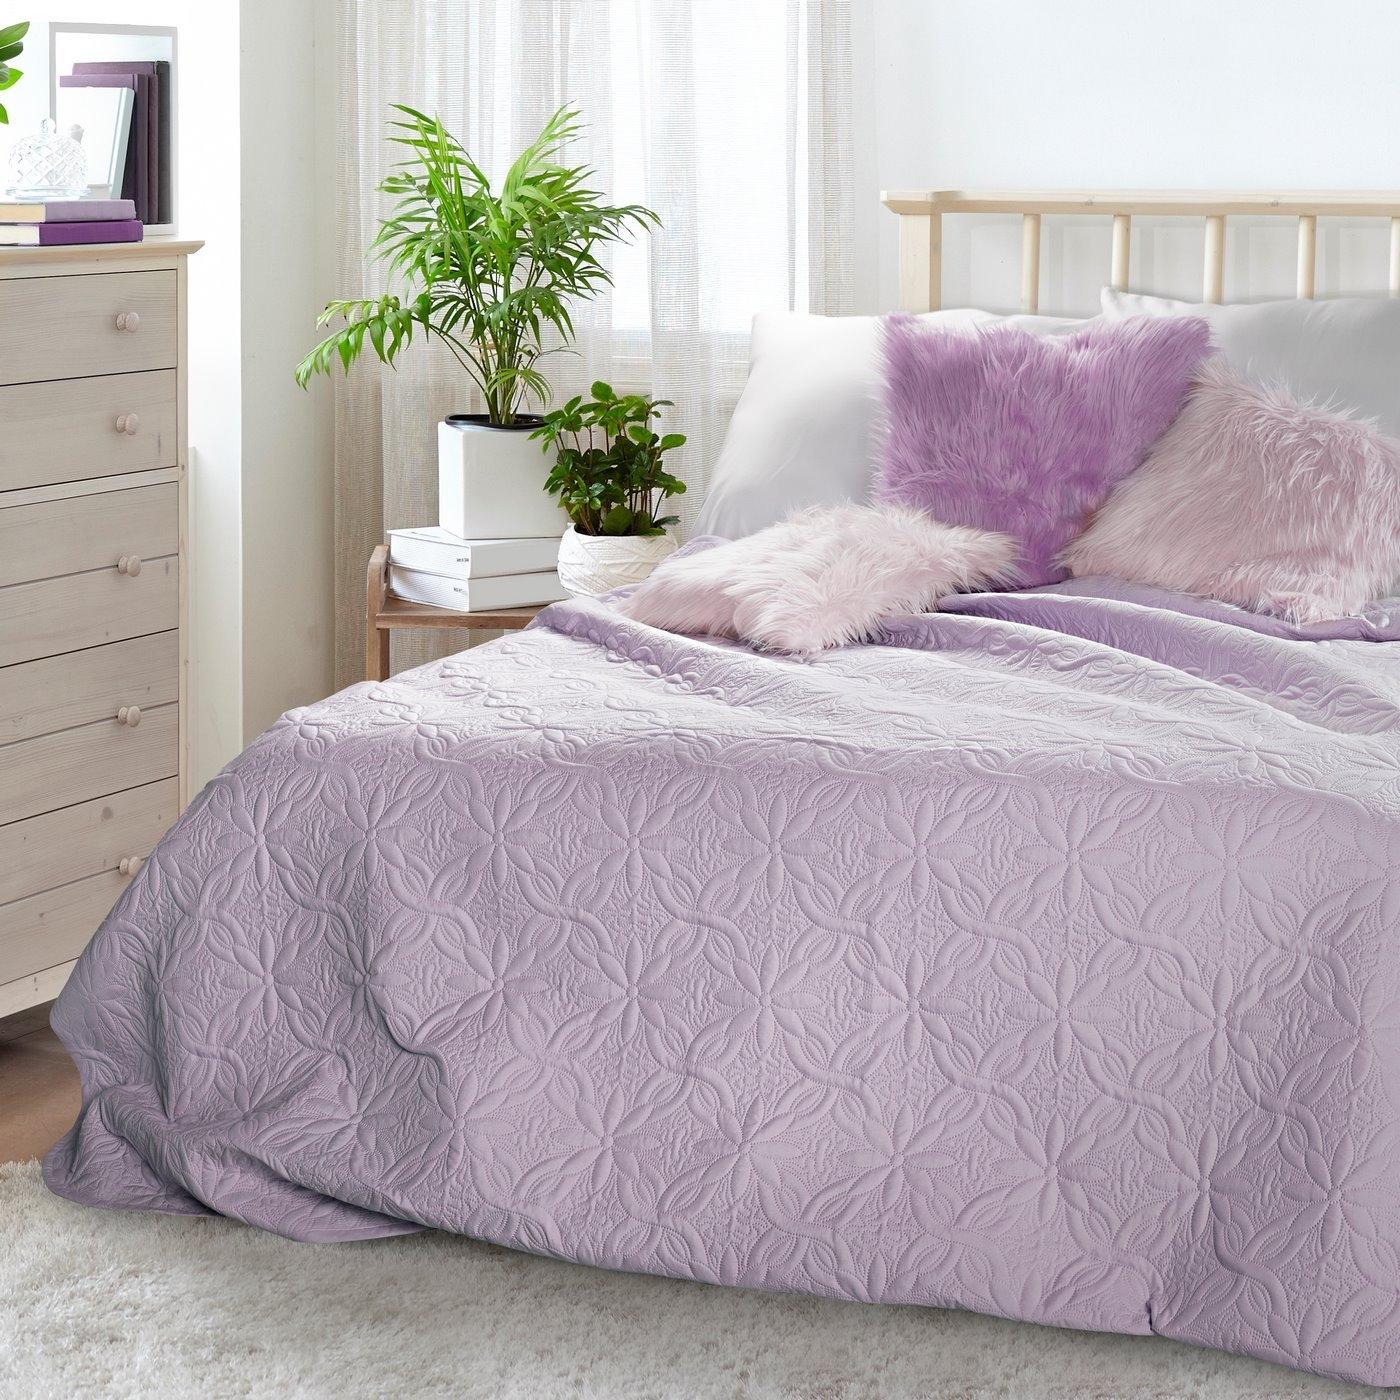 Cuvertura reversibila Floral Purple 220 x 240 cm